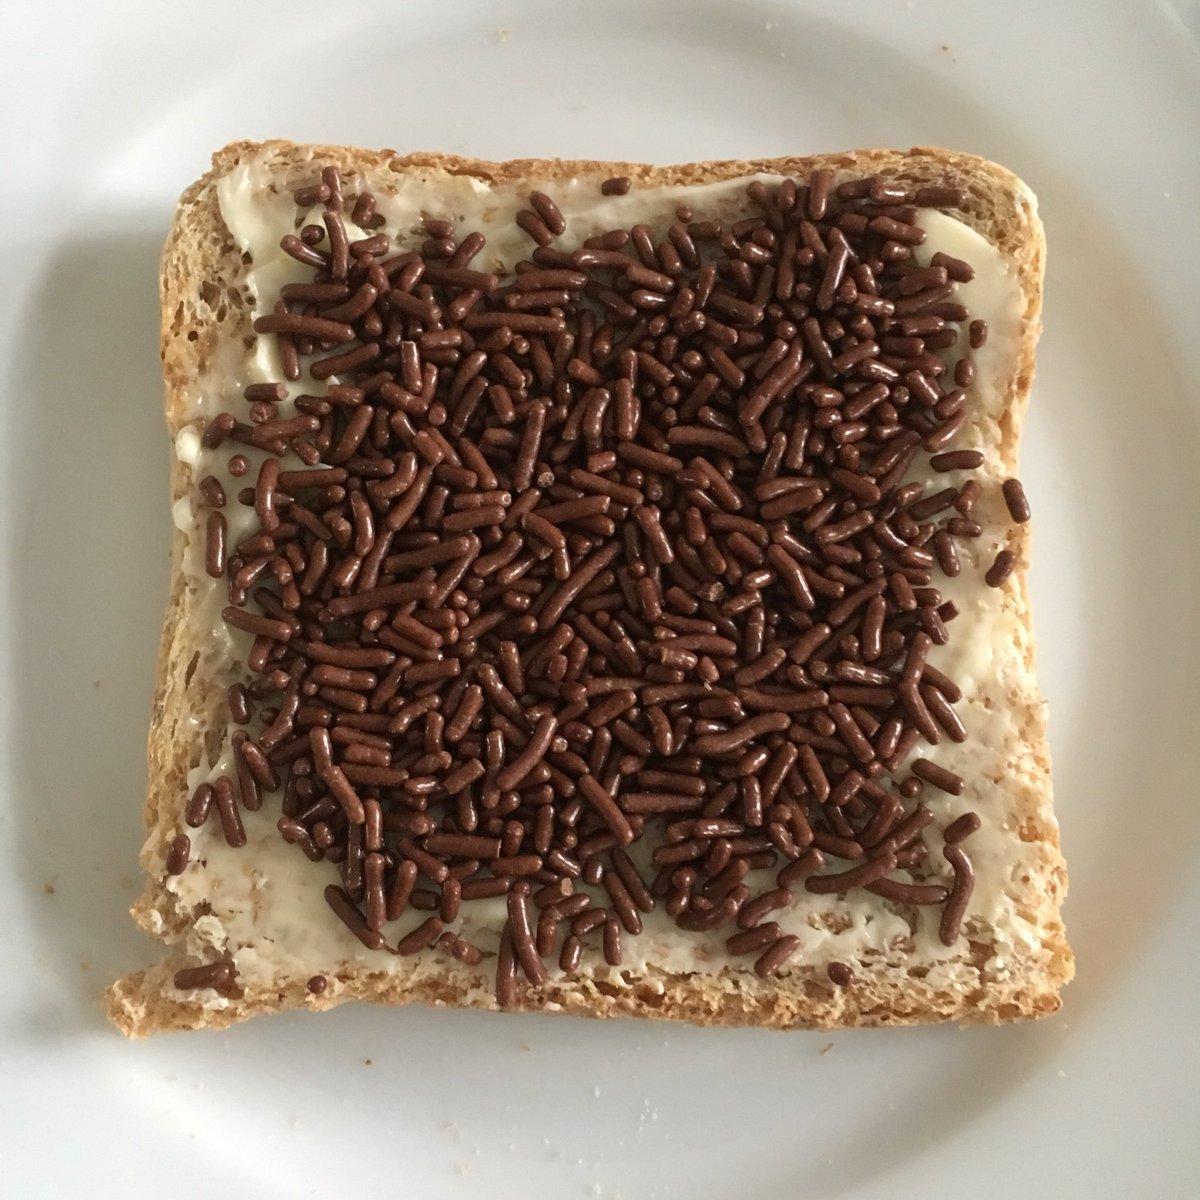 Heute Schokolade zum Frühstück. Nennt mi...